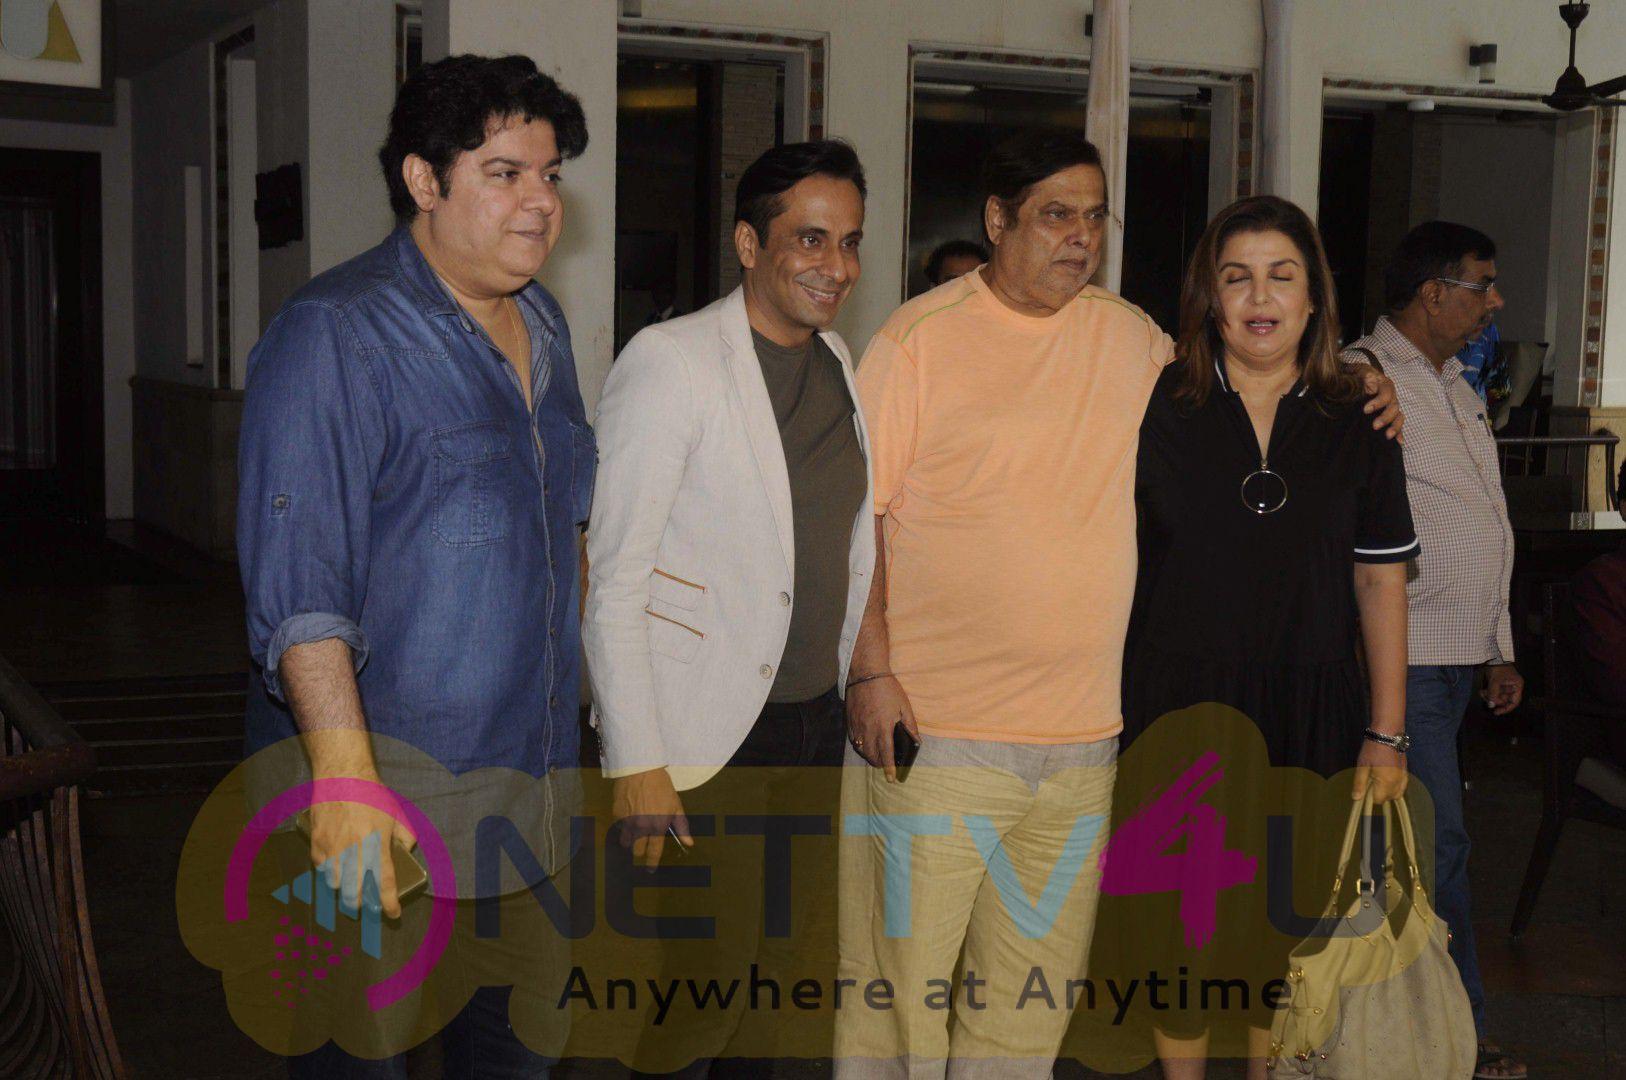 Launch Funny Book The Three Wise Monkeys With David Dhawan & Farah Khan & Sajid Khan Photos Hindi Gallery